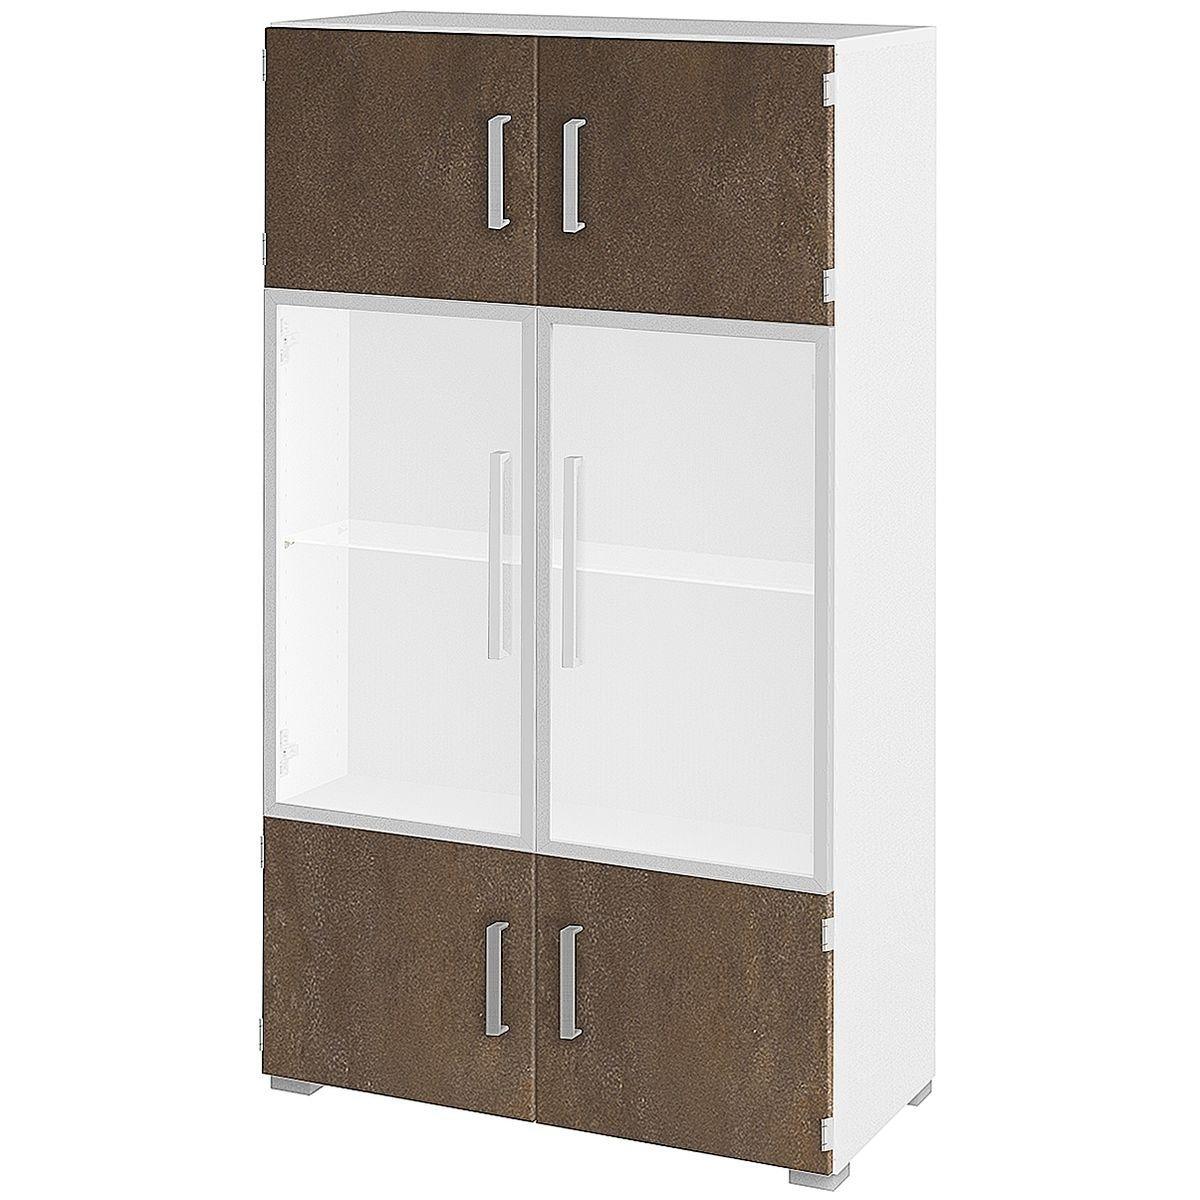 Aktenschrank 4 OH breit 1 Glasboden »Objekt Plus«   Büro > Büroschränke > Aktenschränke   Kunststoff